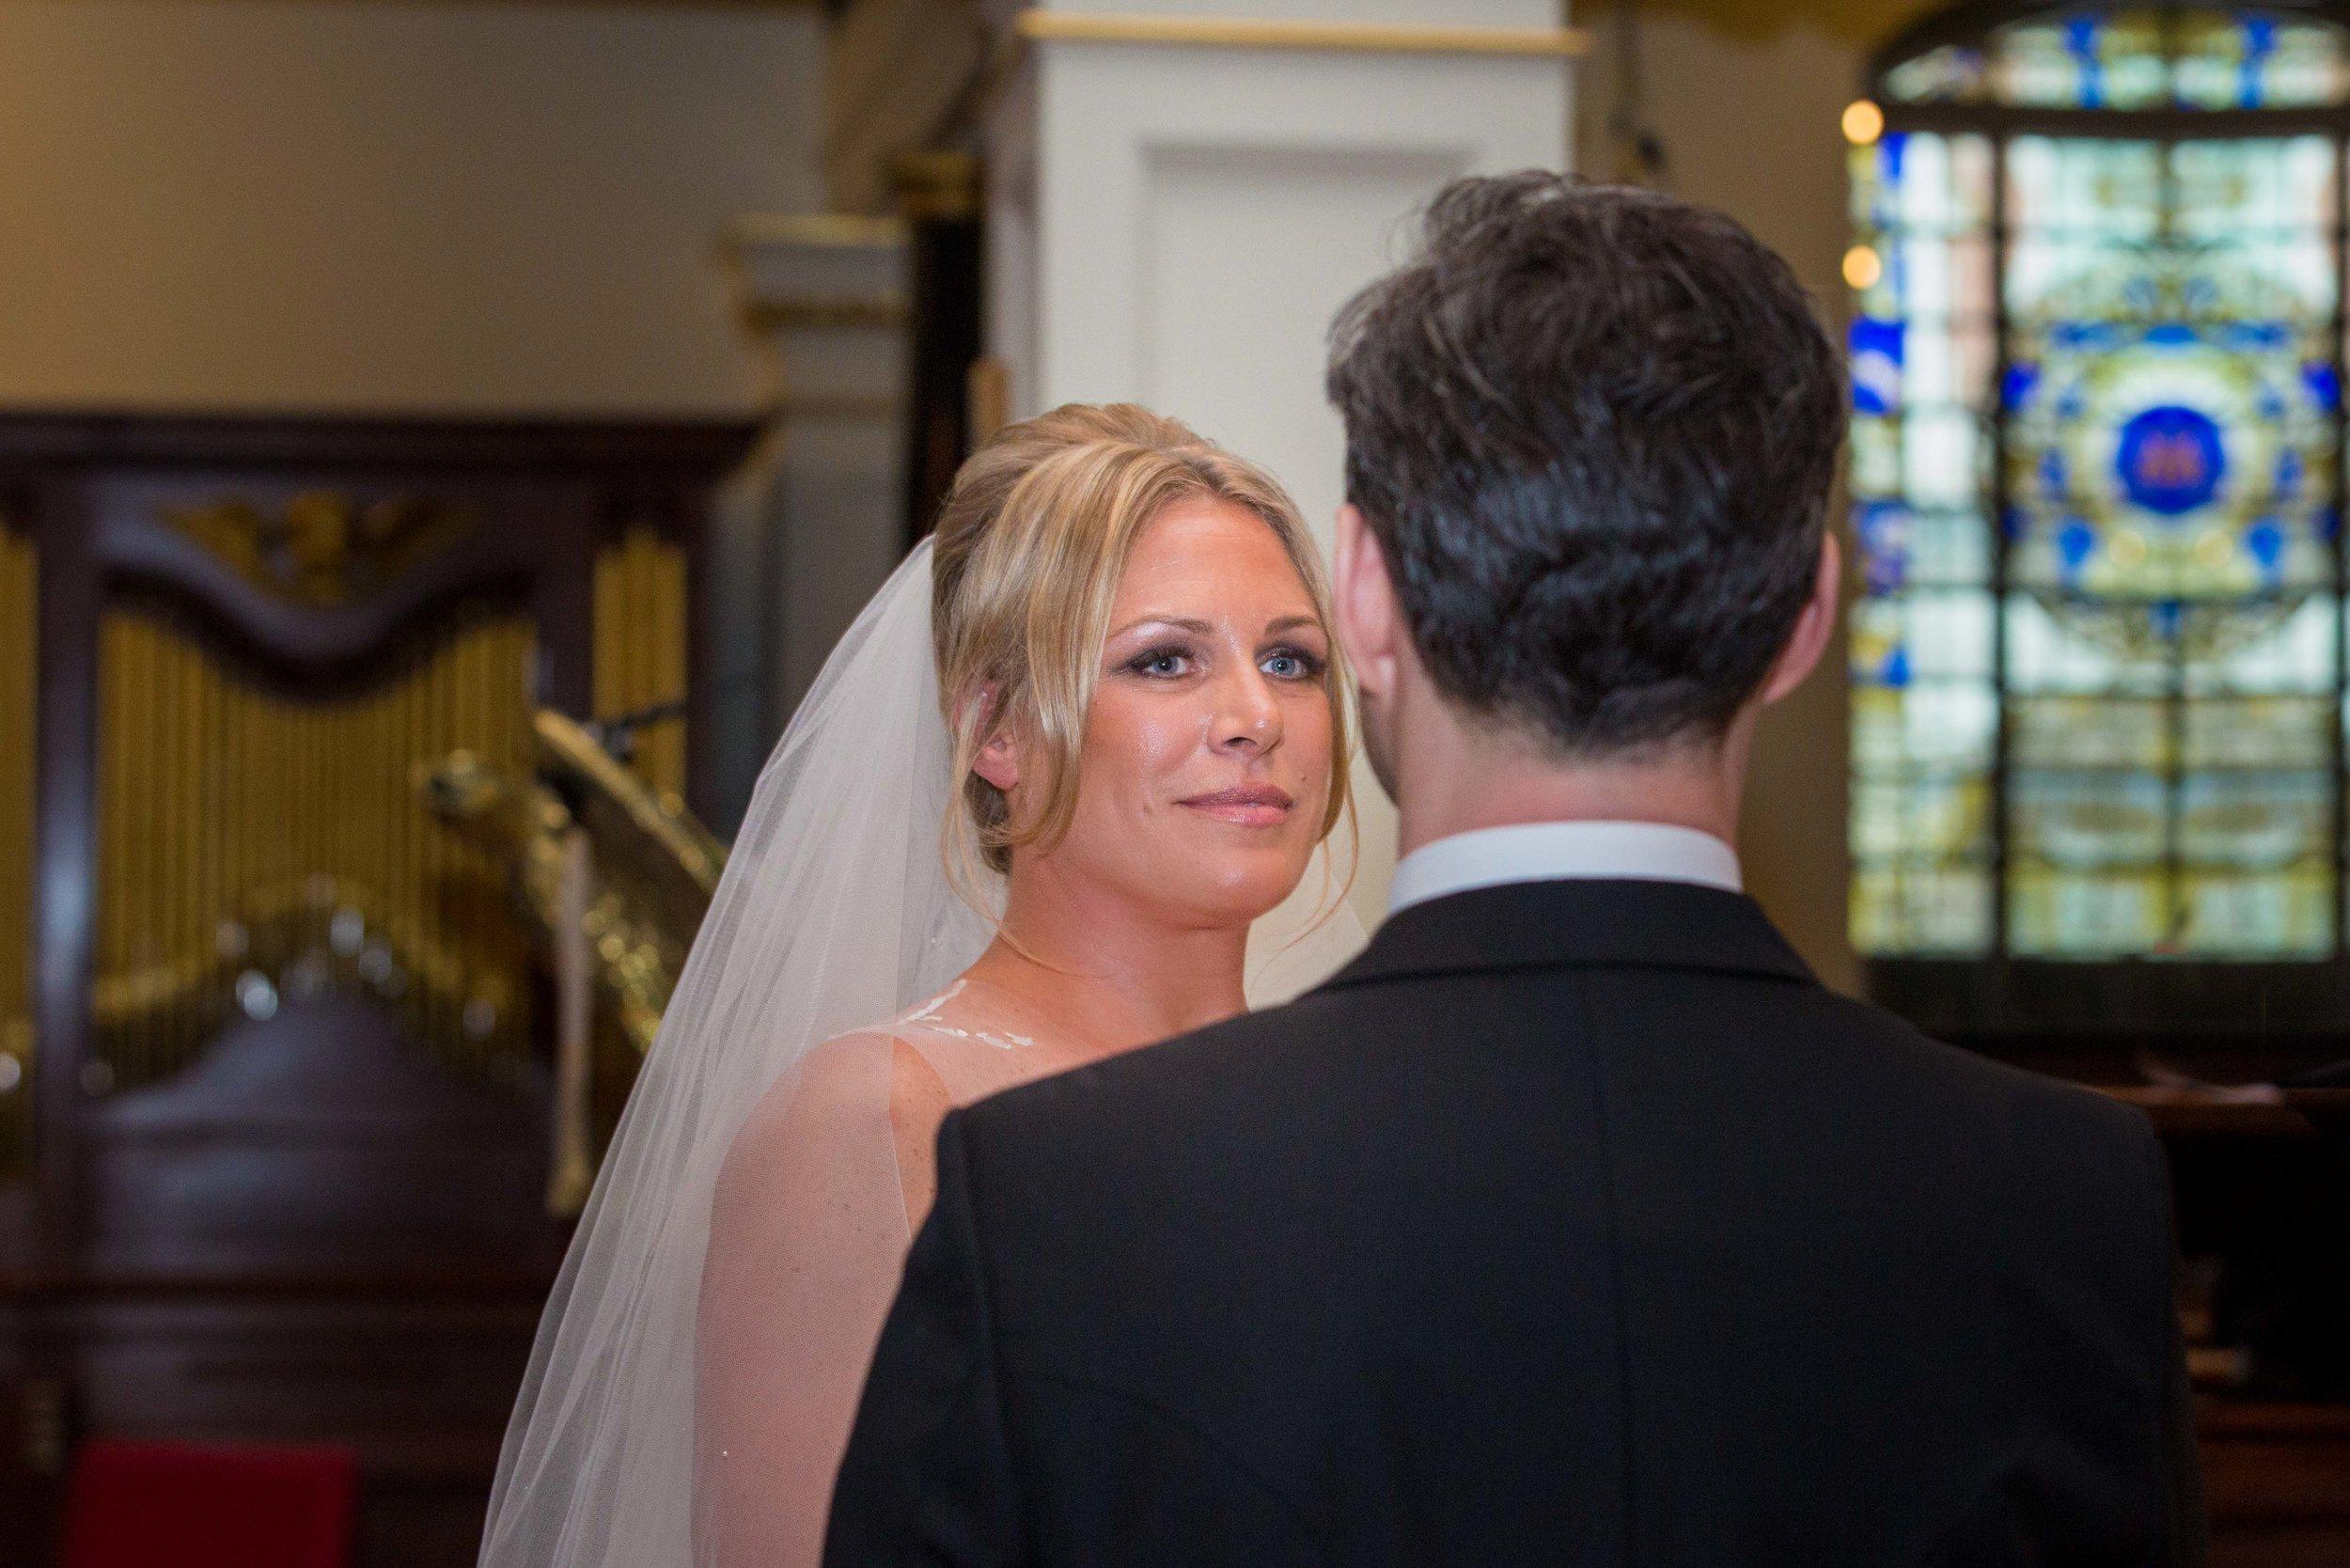 claridges-hotel-wedding-photographer-london-mayfair-natalia-smith-photography-66.jpg